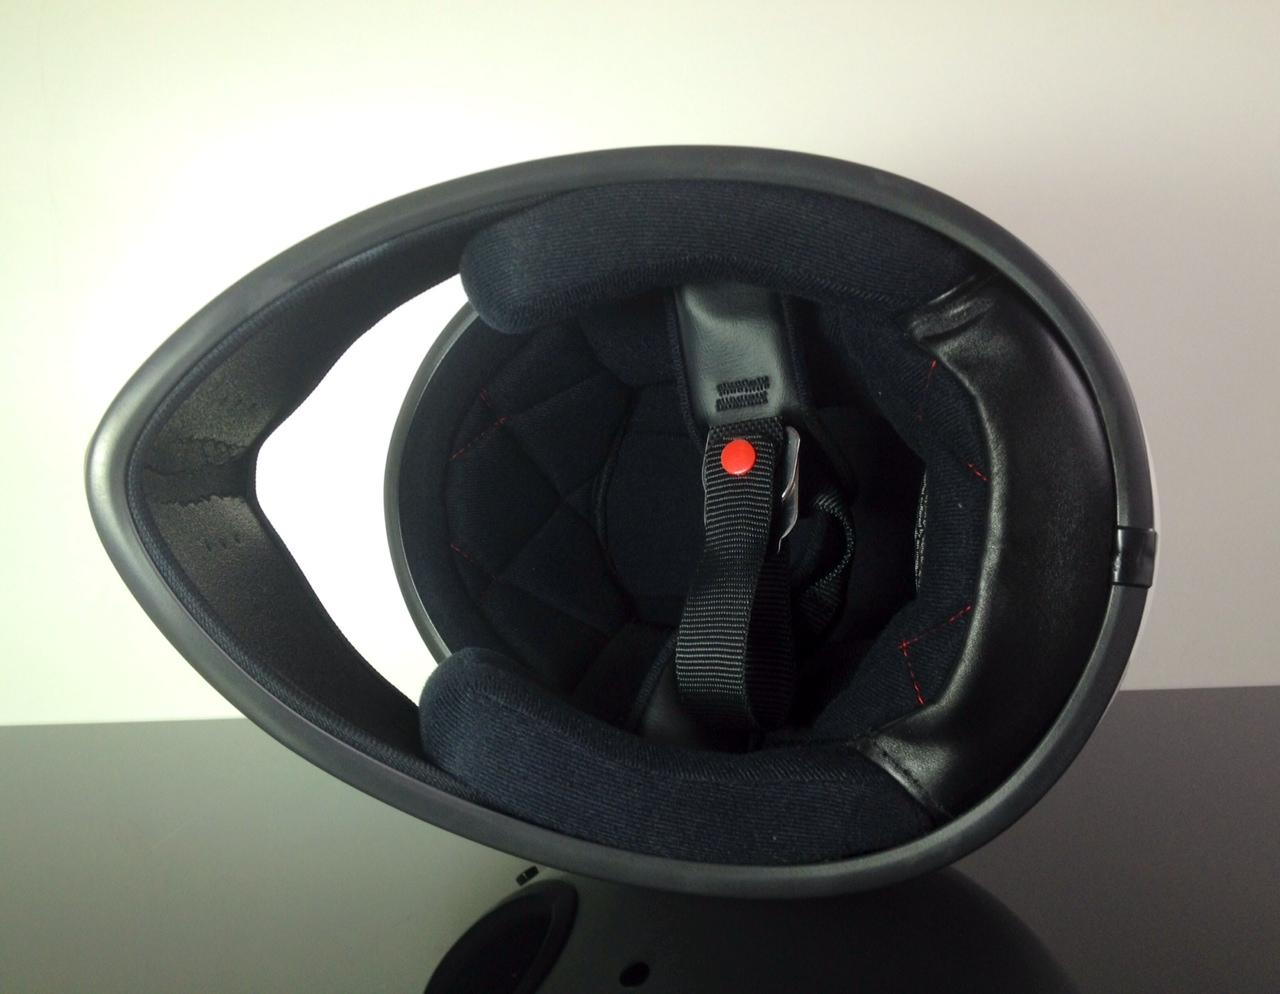 retro style cross helmet flattblack dot approved m ch d m. Black Bedroom Furniture Sets. Home Design Ideas